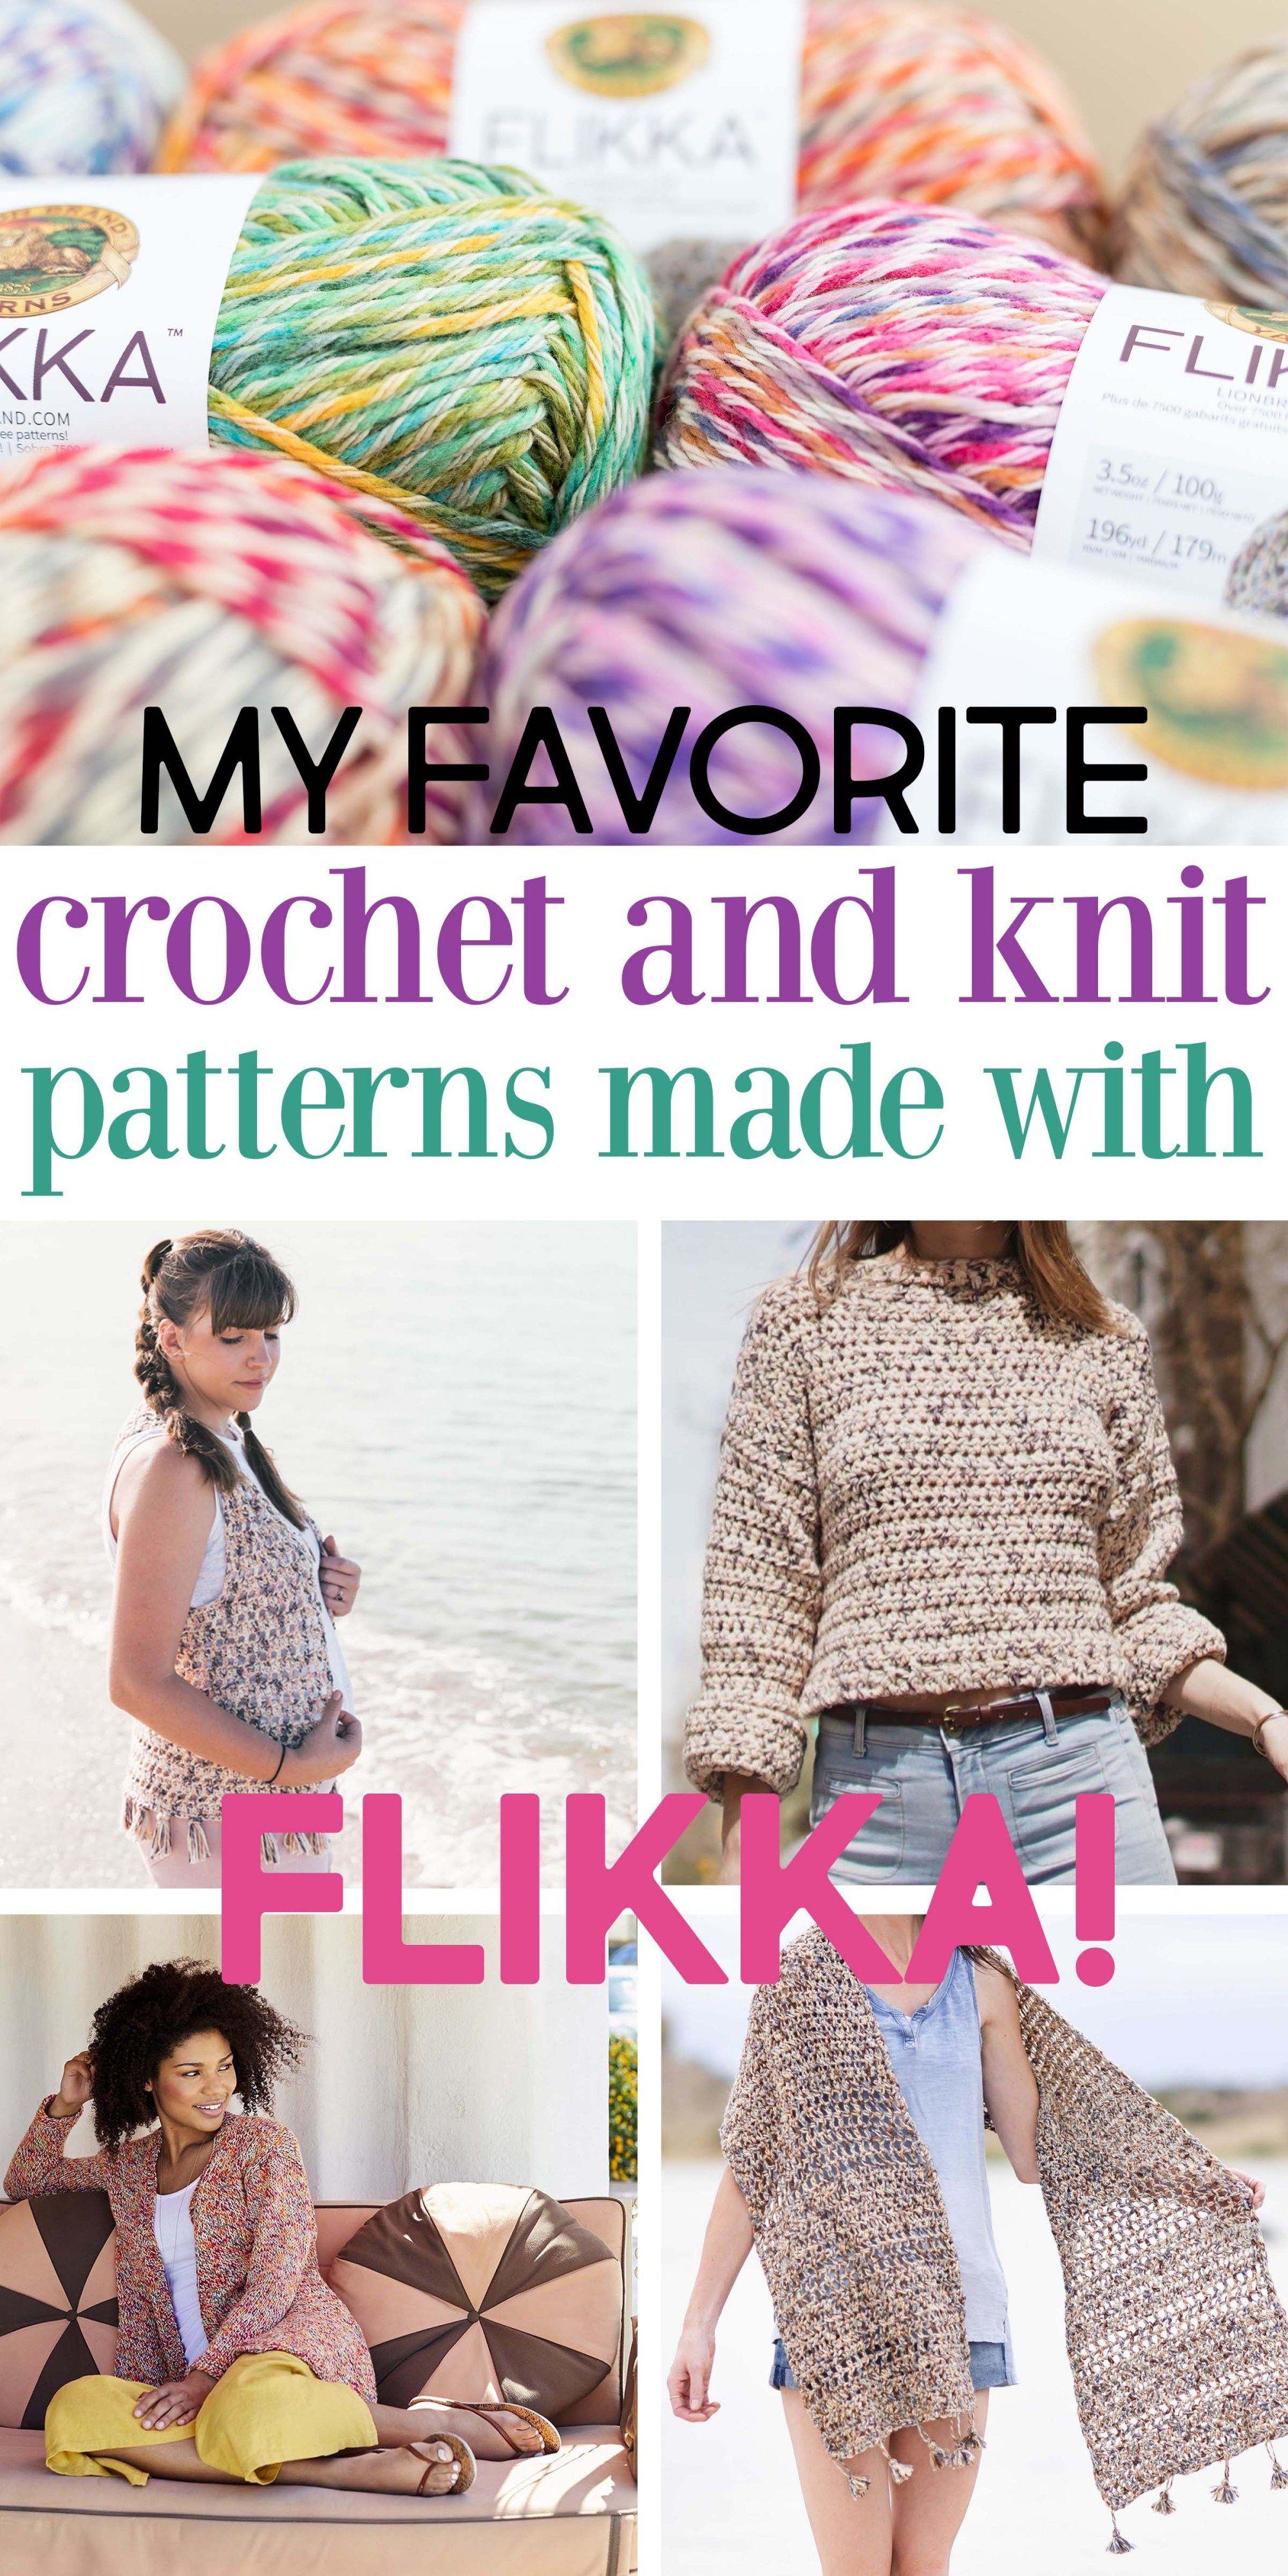 10 Lion Brand Flikka Crochet Knit Patterns Sewrella Free Crochet Pattern Crochet Cardigan Pattern Crochet